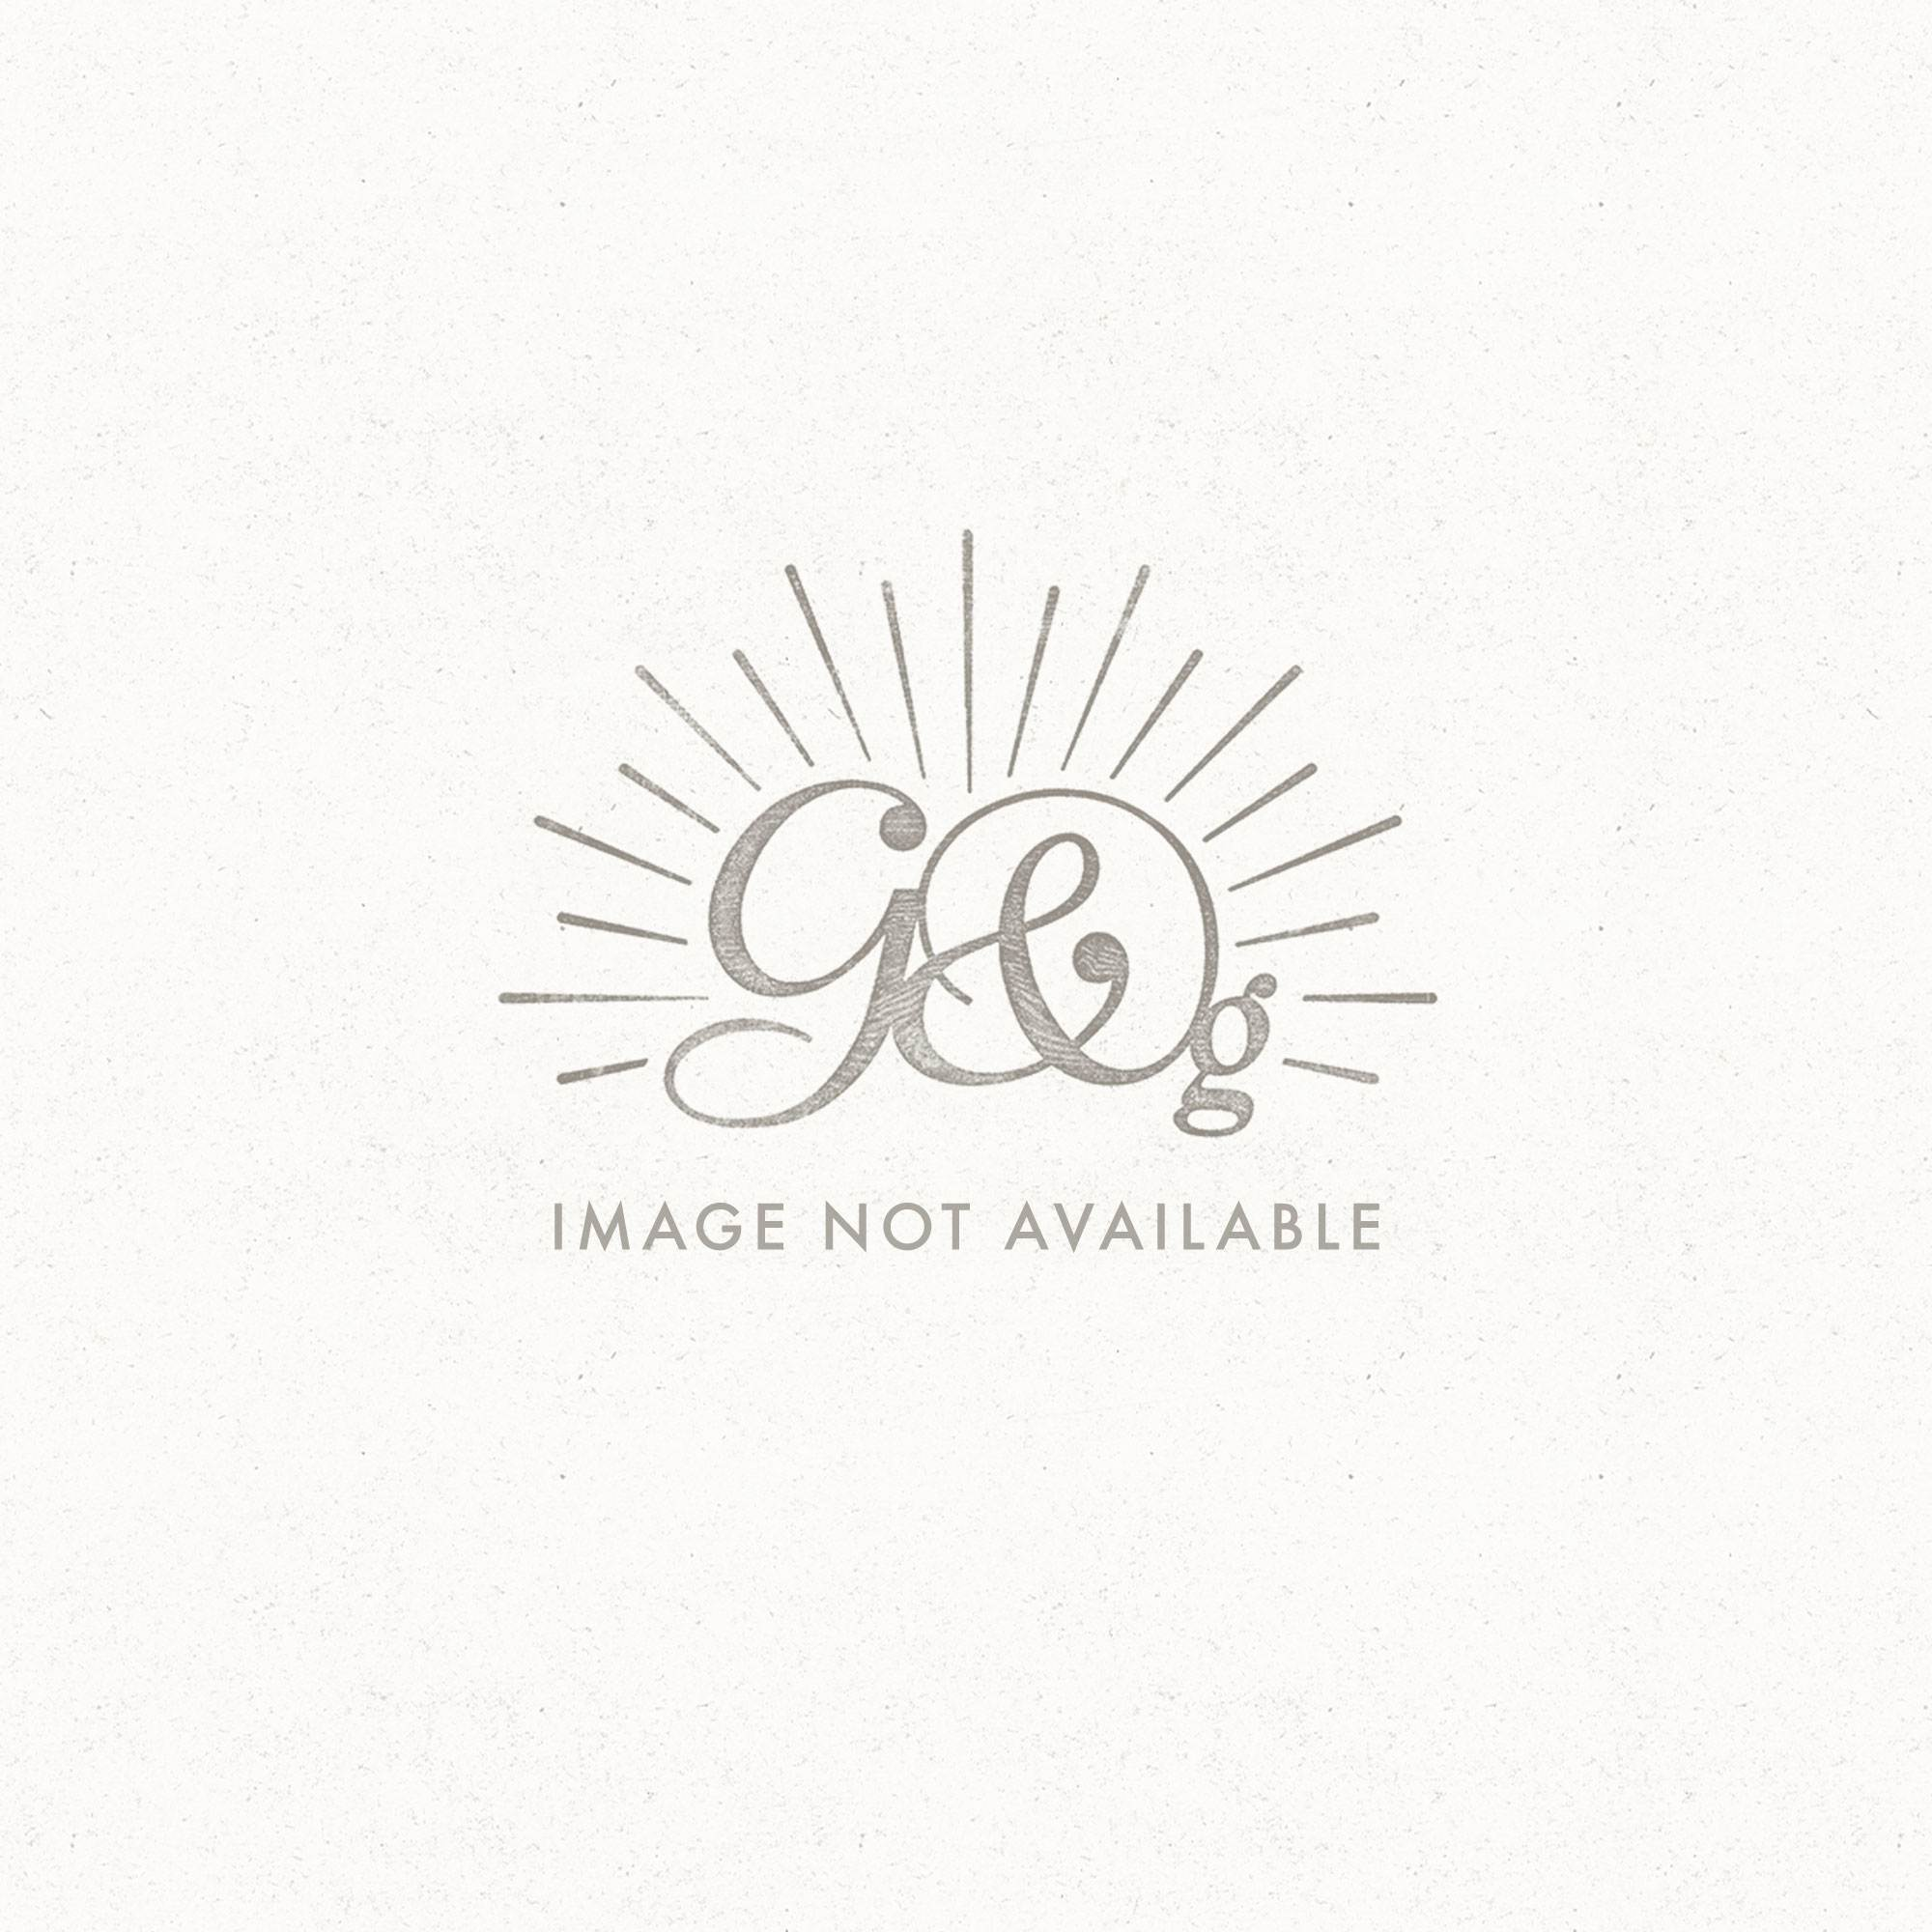 Elfie Selfie Photo Kit - Thumbnail